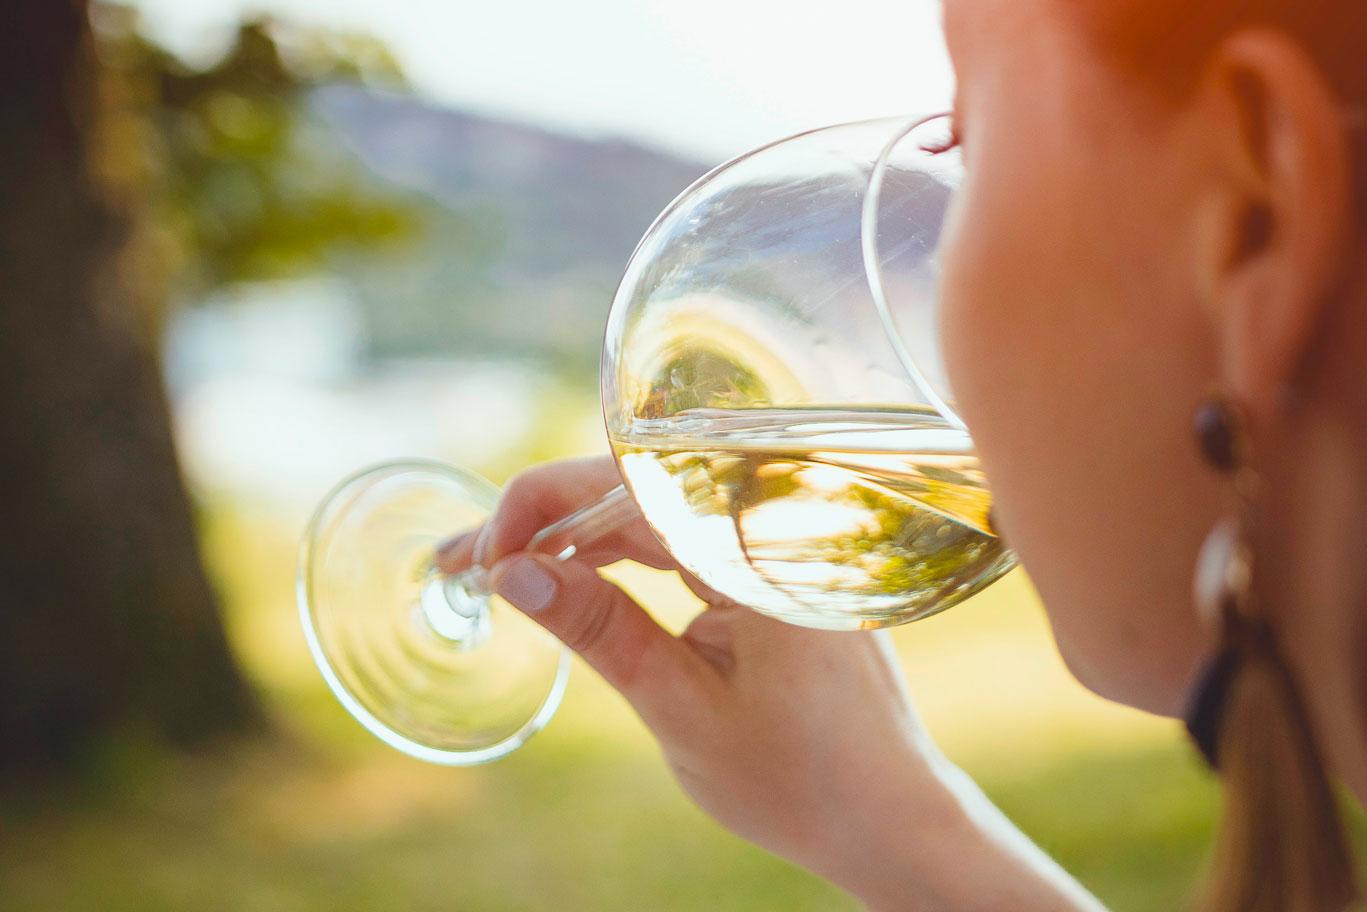 bessìu nasco di Cagliari audarya doc Sardegna autoctono vino bianco